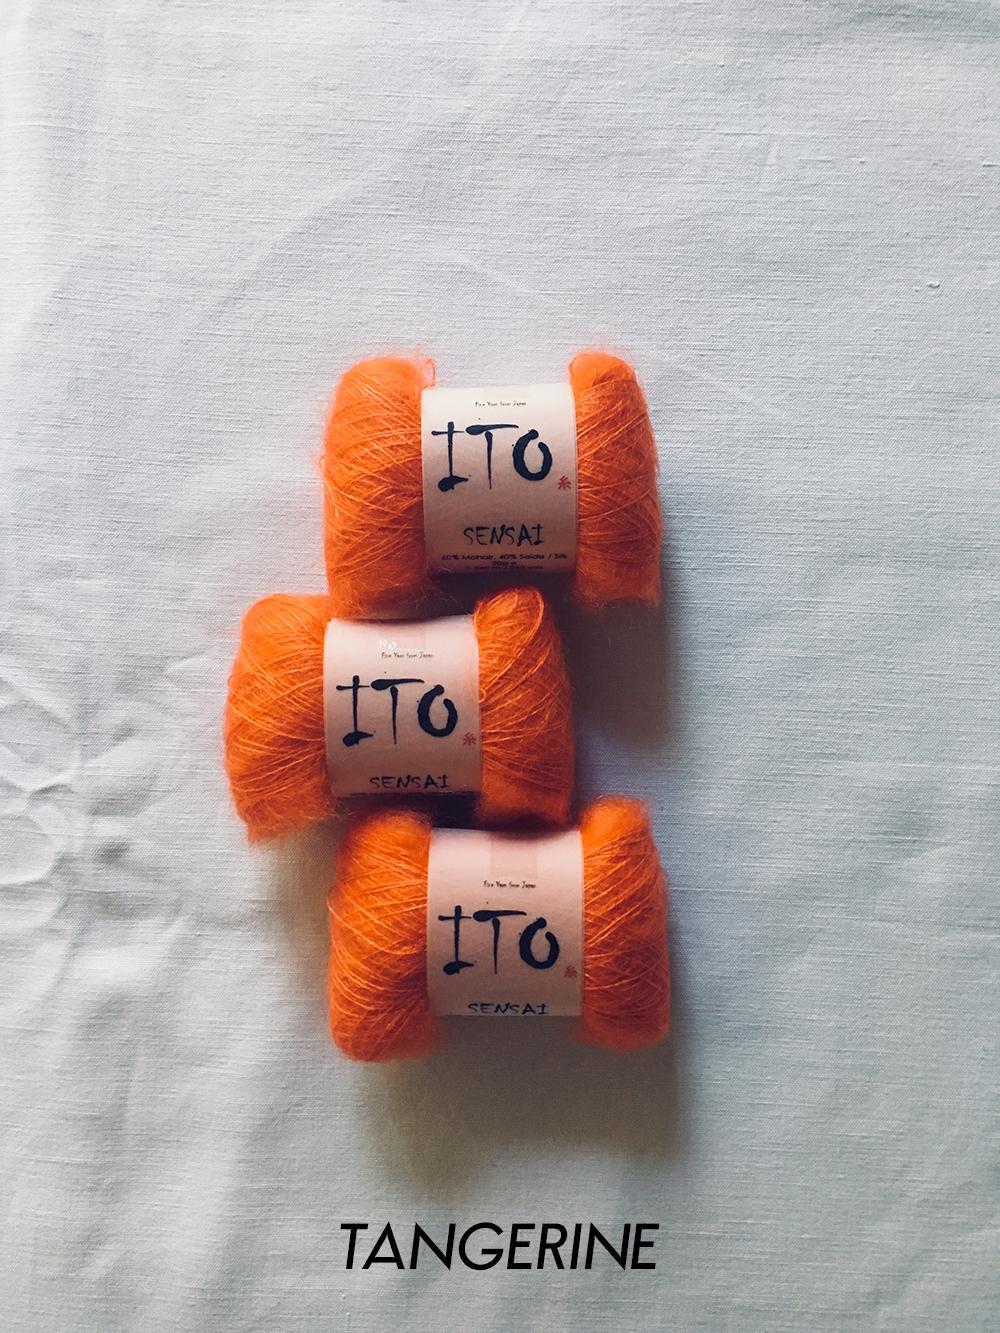 ito_sensai_tangerine_338_wool_done_knitting.jpg